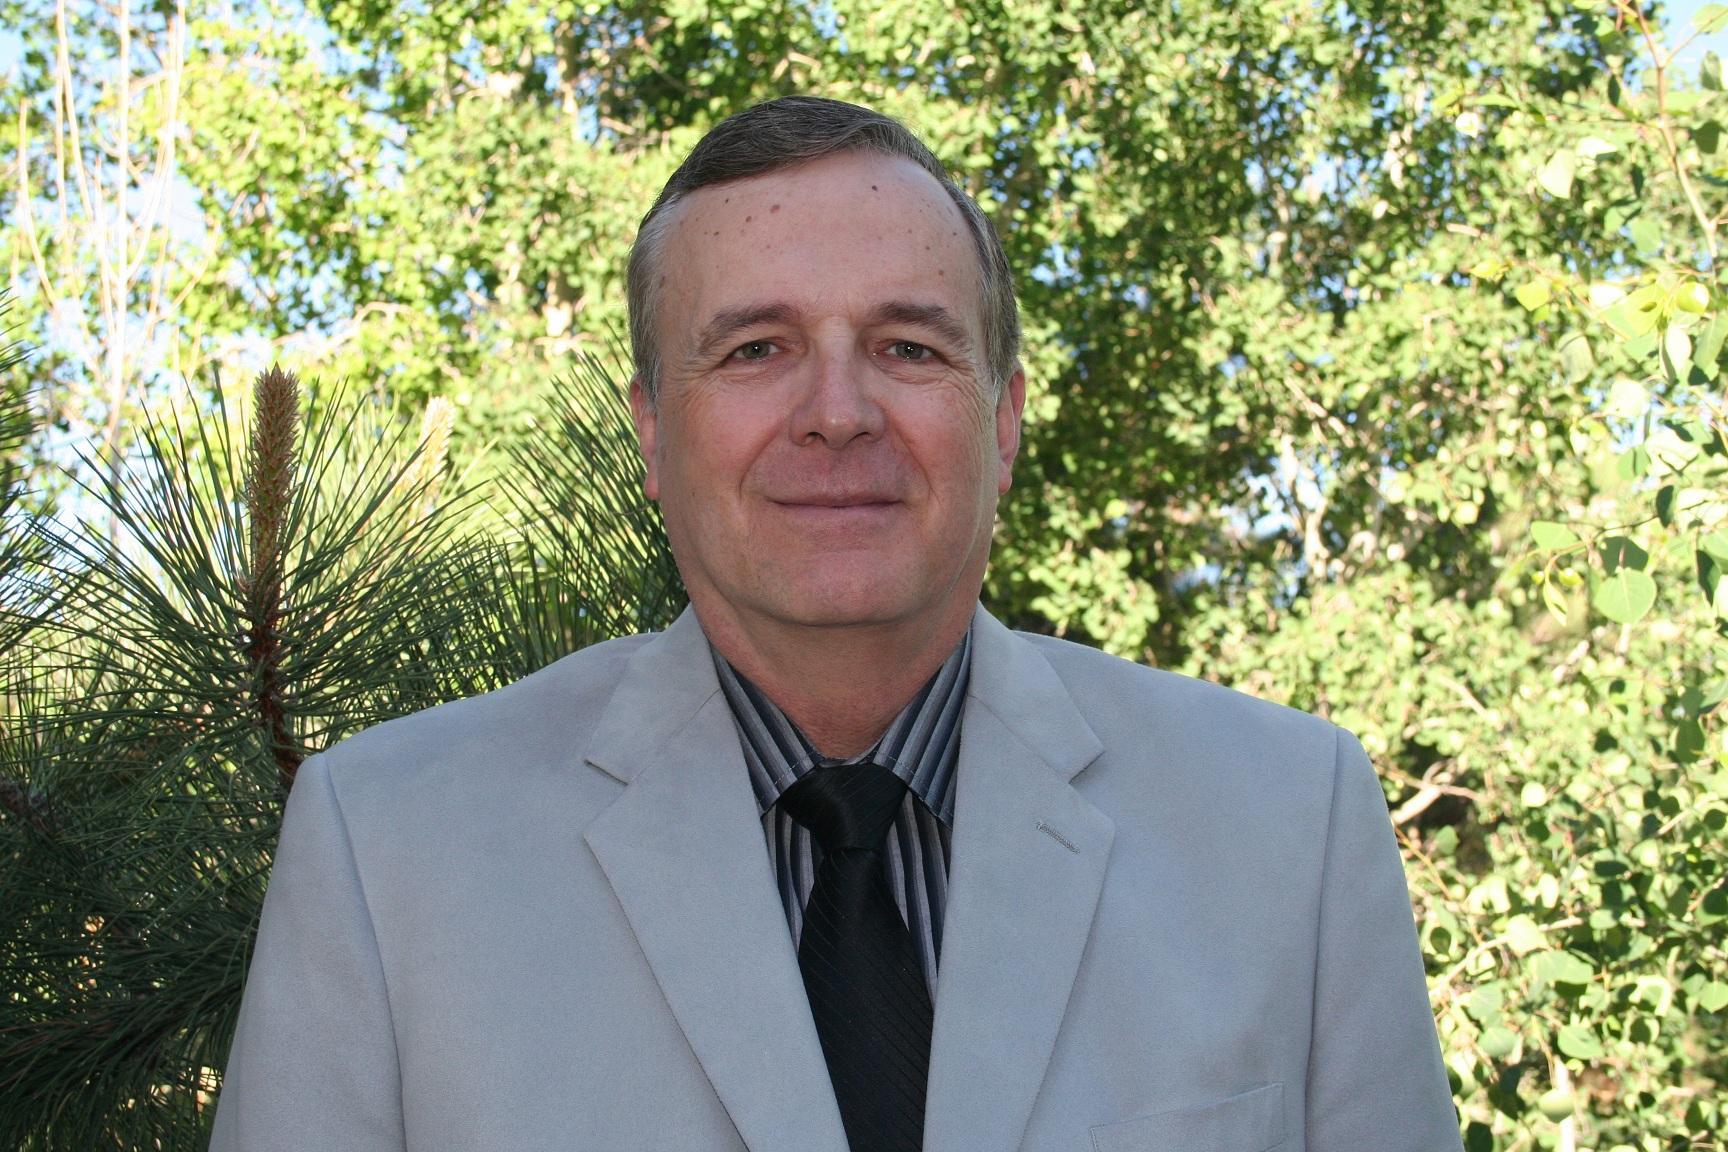 DENNIS BLEVINS  Your Financial Professional & Insurance Agent